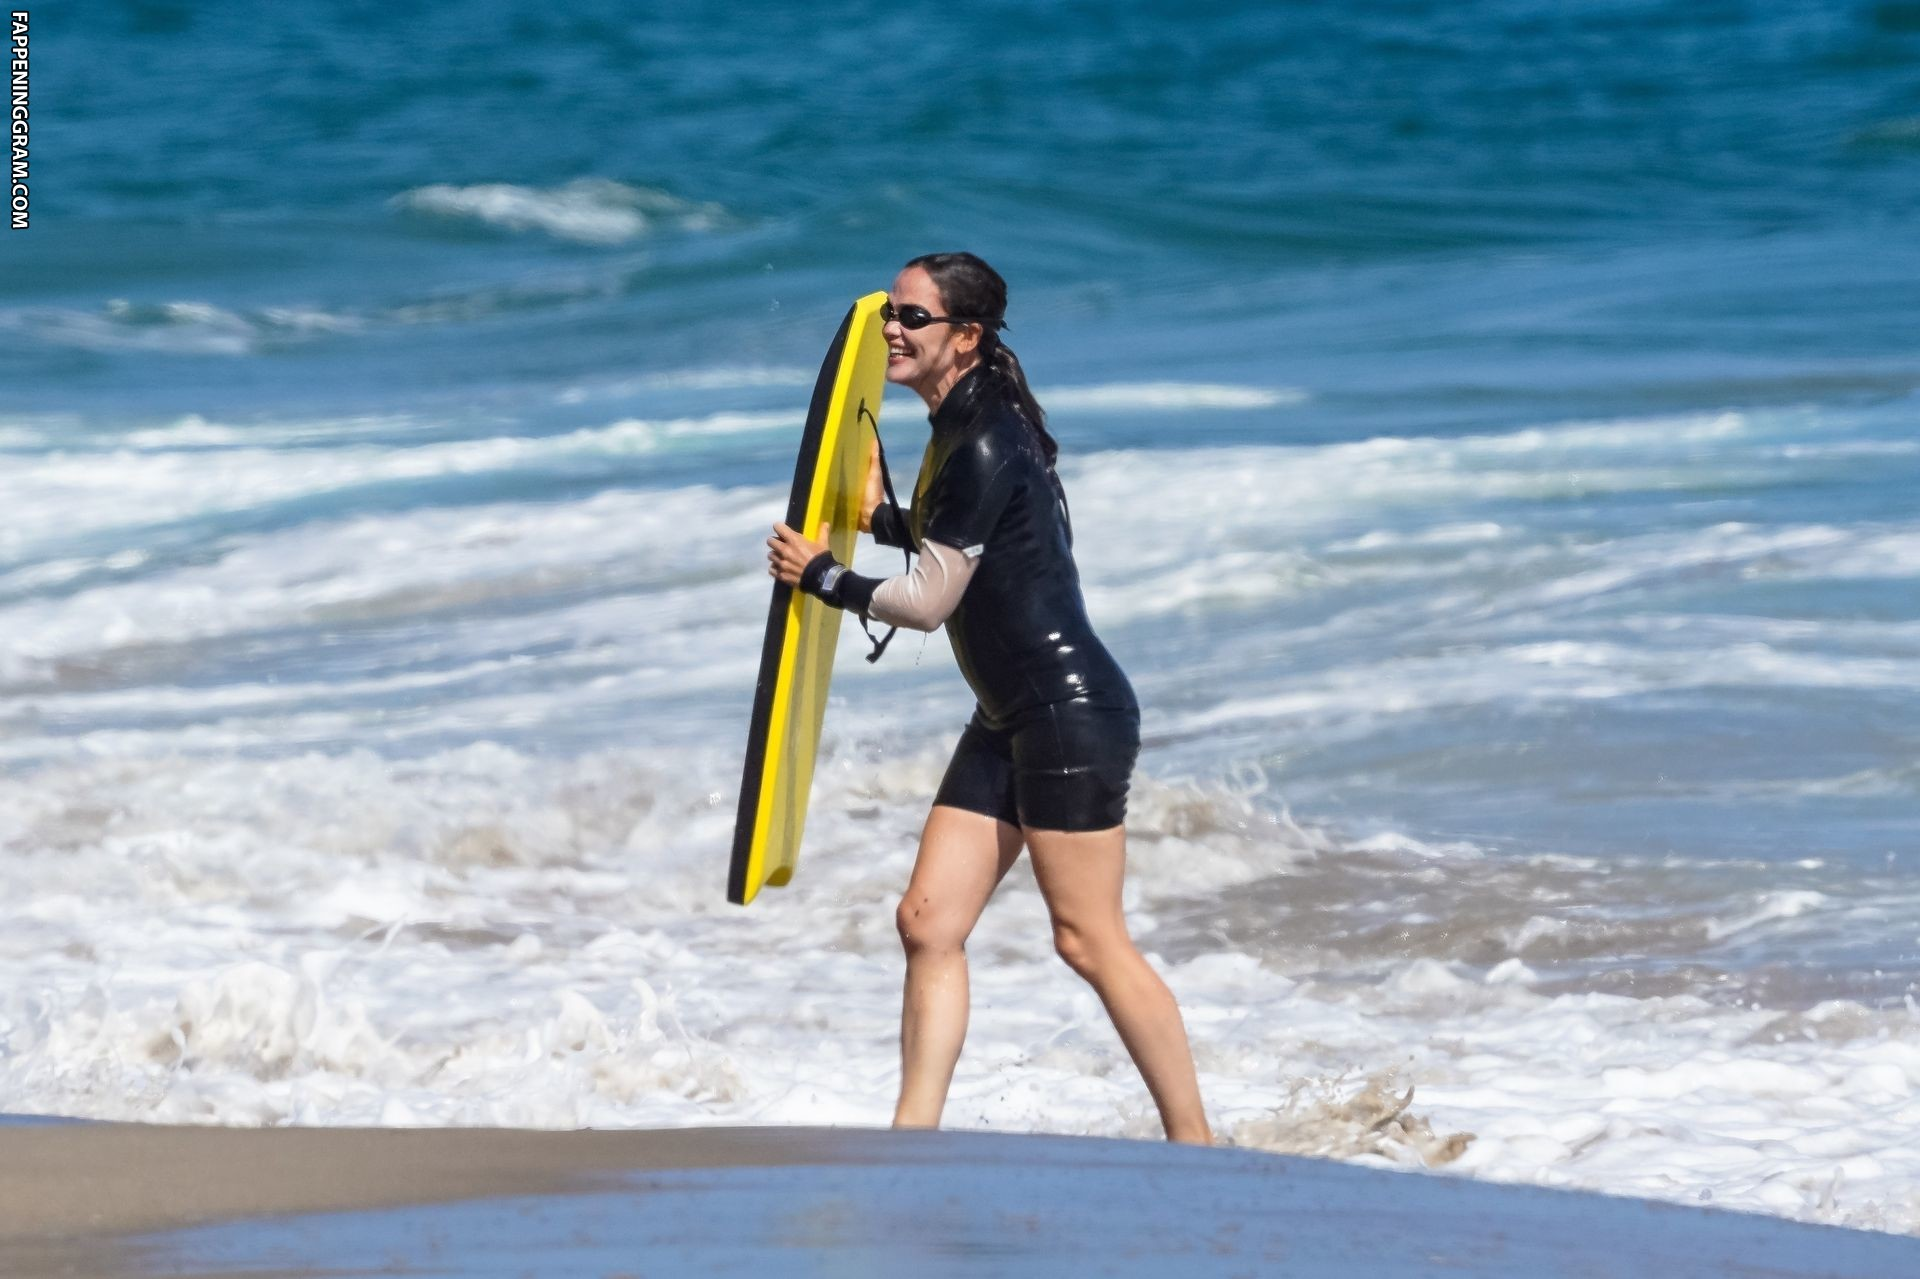 Jennifer Garner Nude The Fappening - FappeningGram